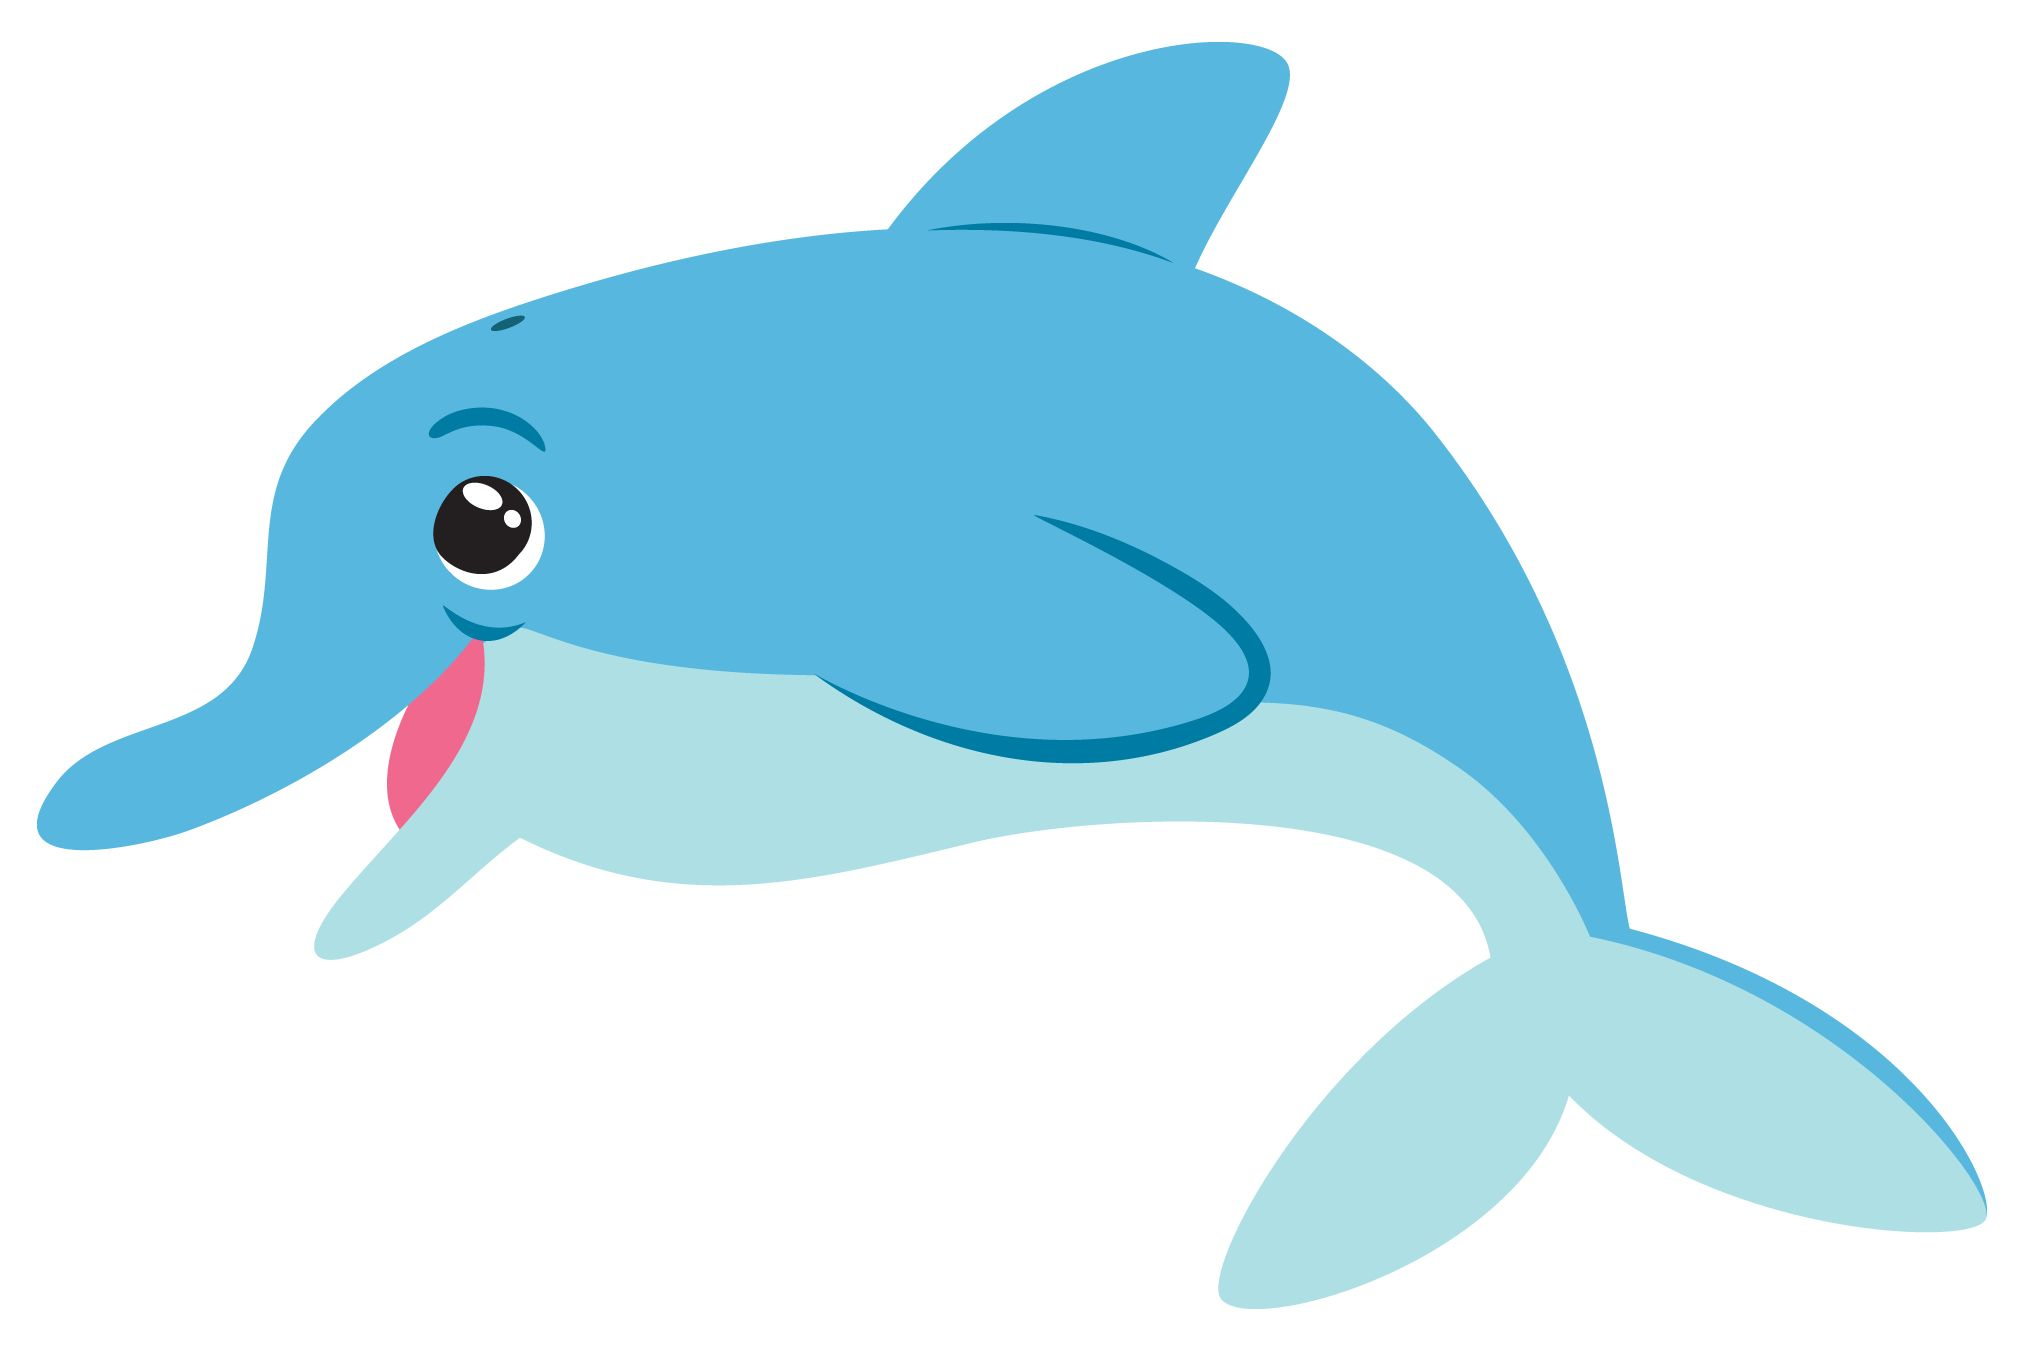 Dolphin template | Templates 2 | Pinterest | Template